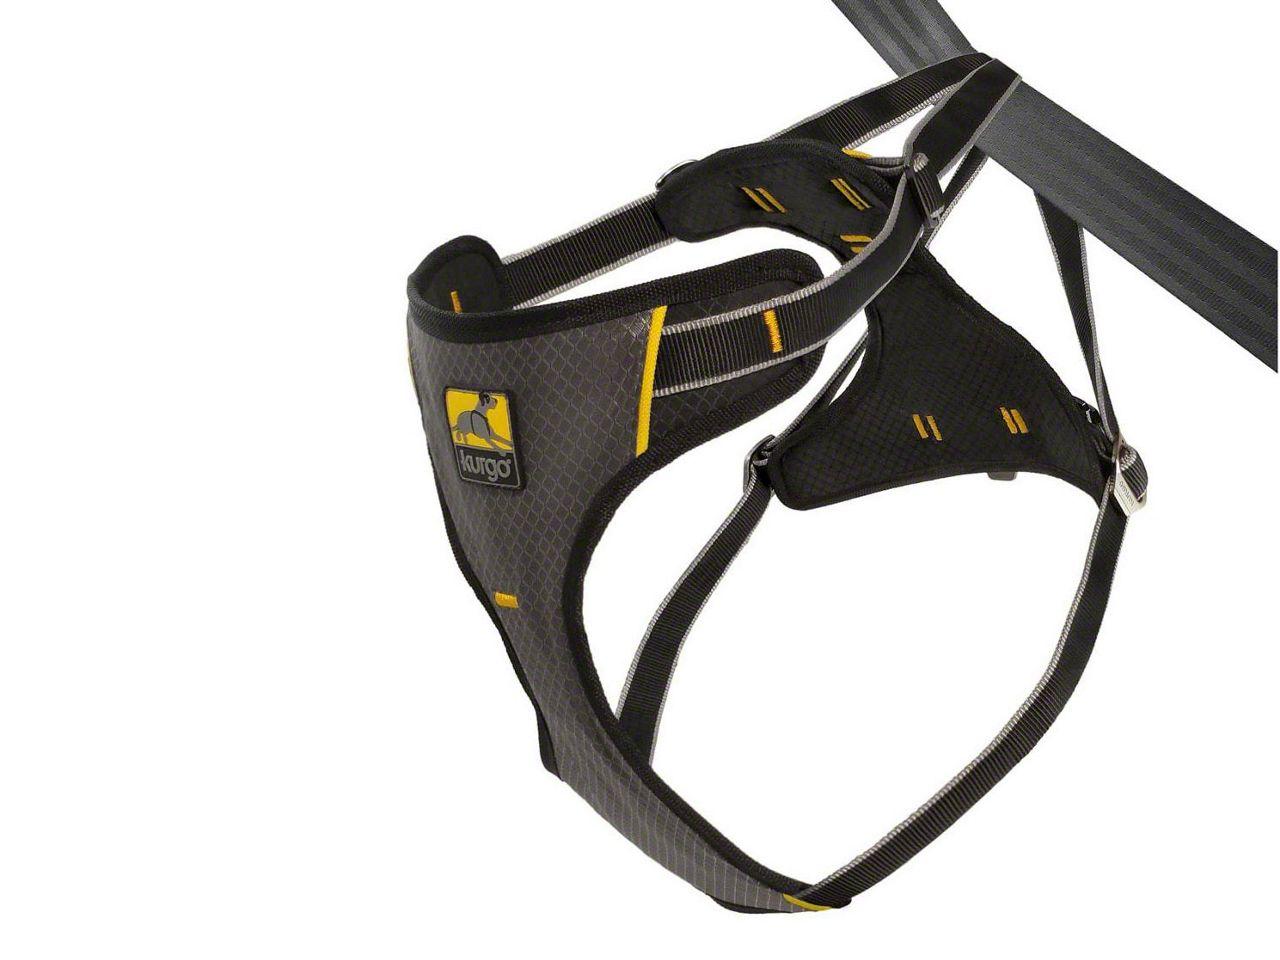 Kurgo Impact Dog Car Harness - Black/Charcoal